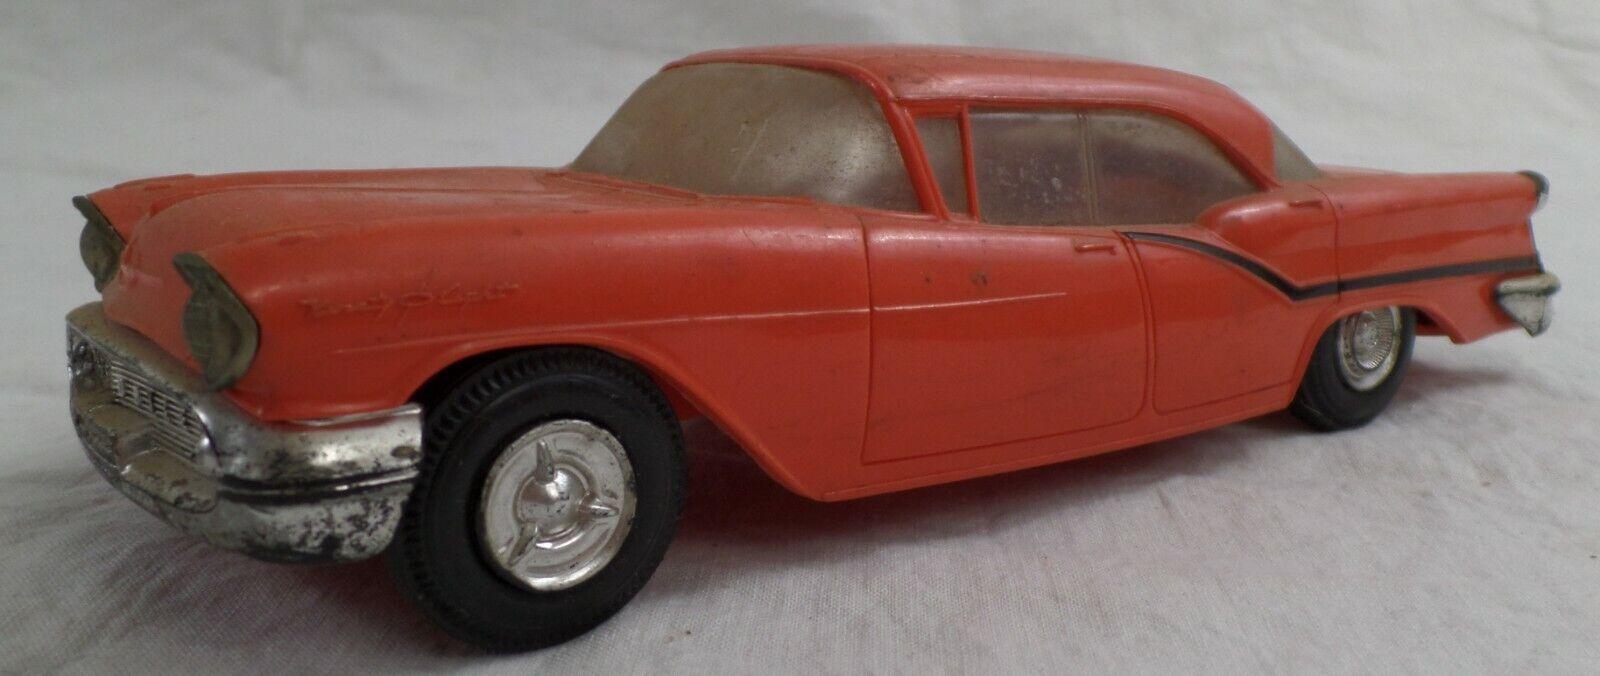 1957 oldsmobile retro Jo han Promotion Promotion Promotion Model, rojo e7c